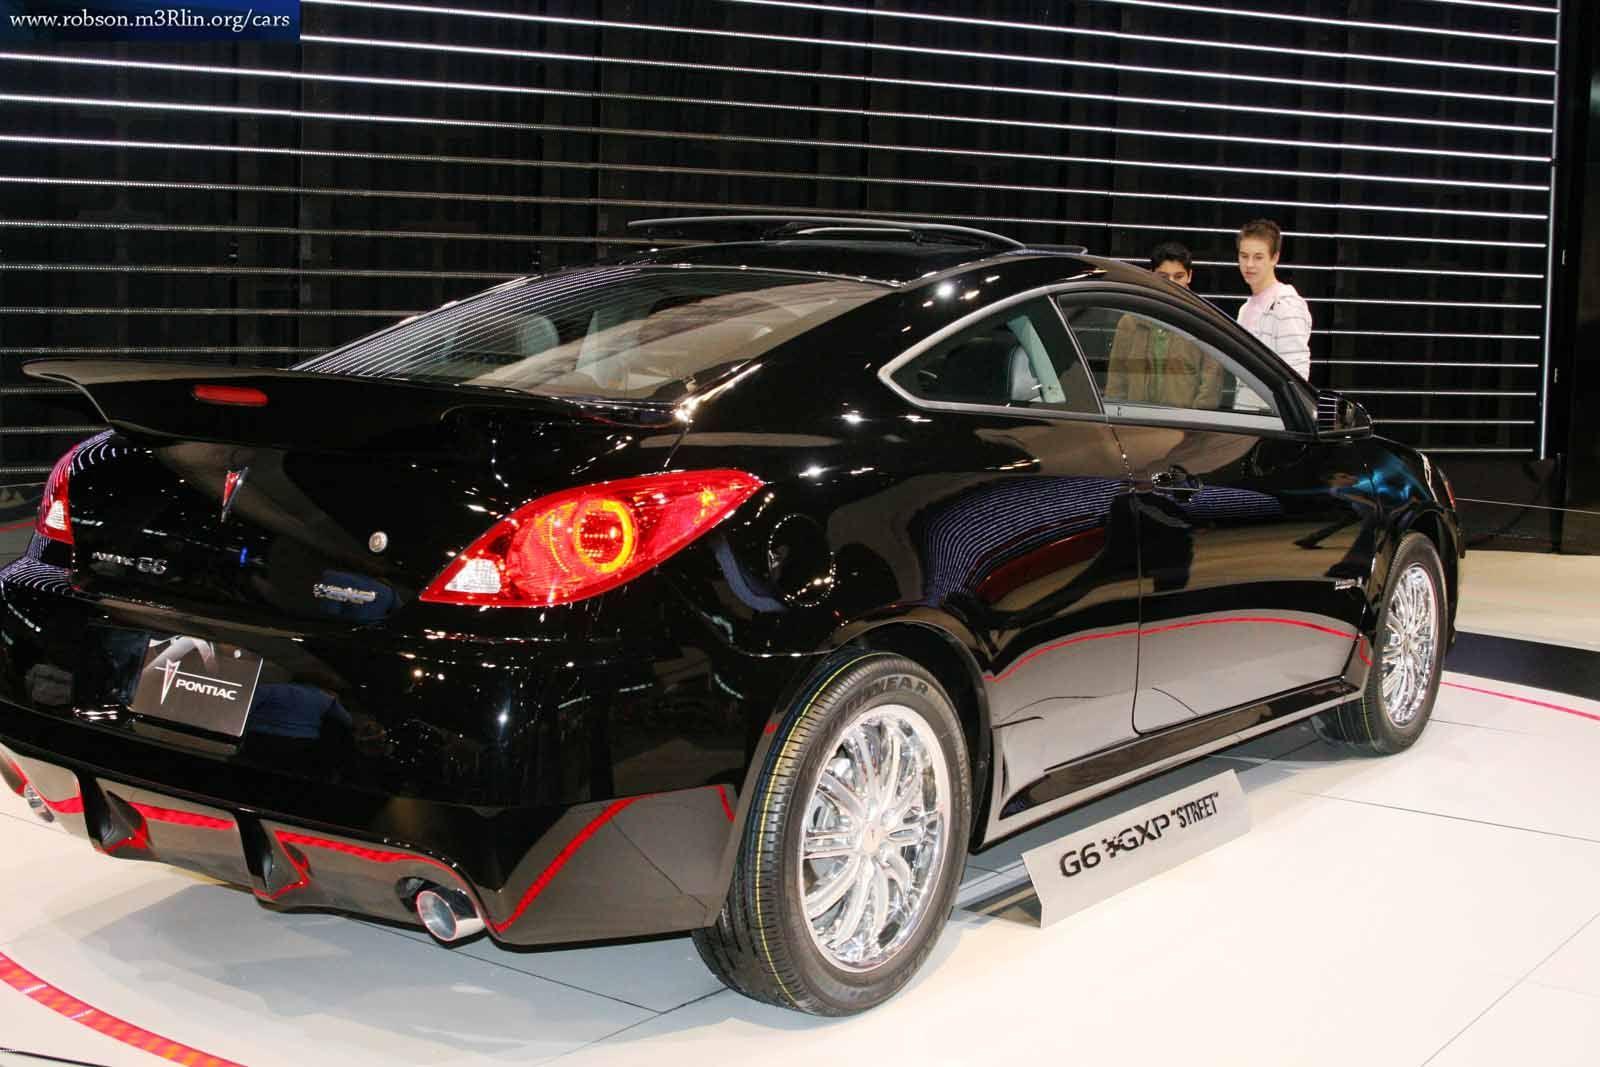 medium resolution of pontiac g6 gt custom engine bay new 2008 g6 gxp performance coupe and sedan bring a new performance